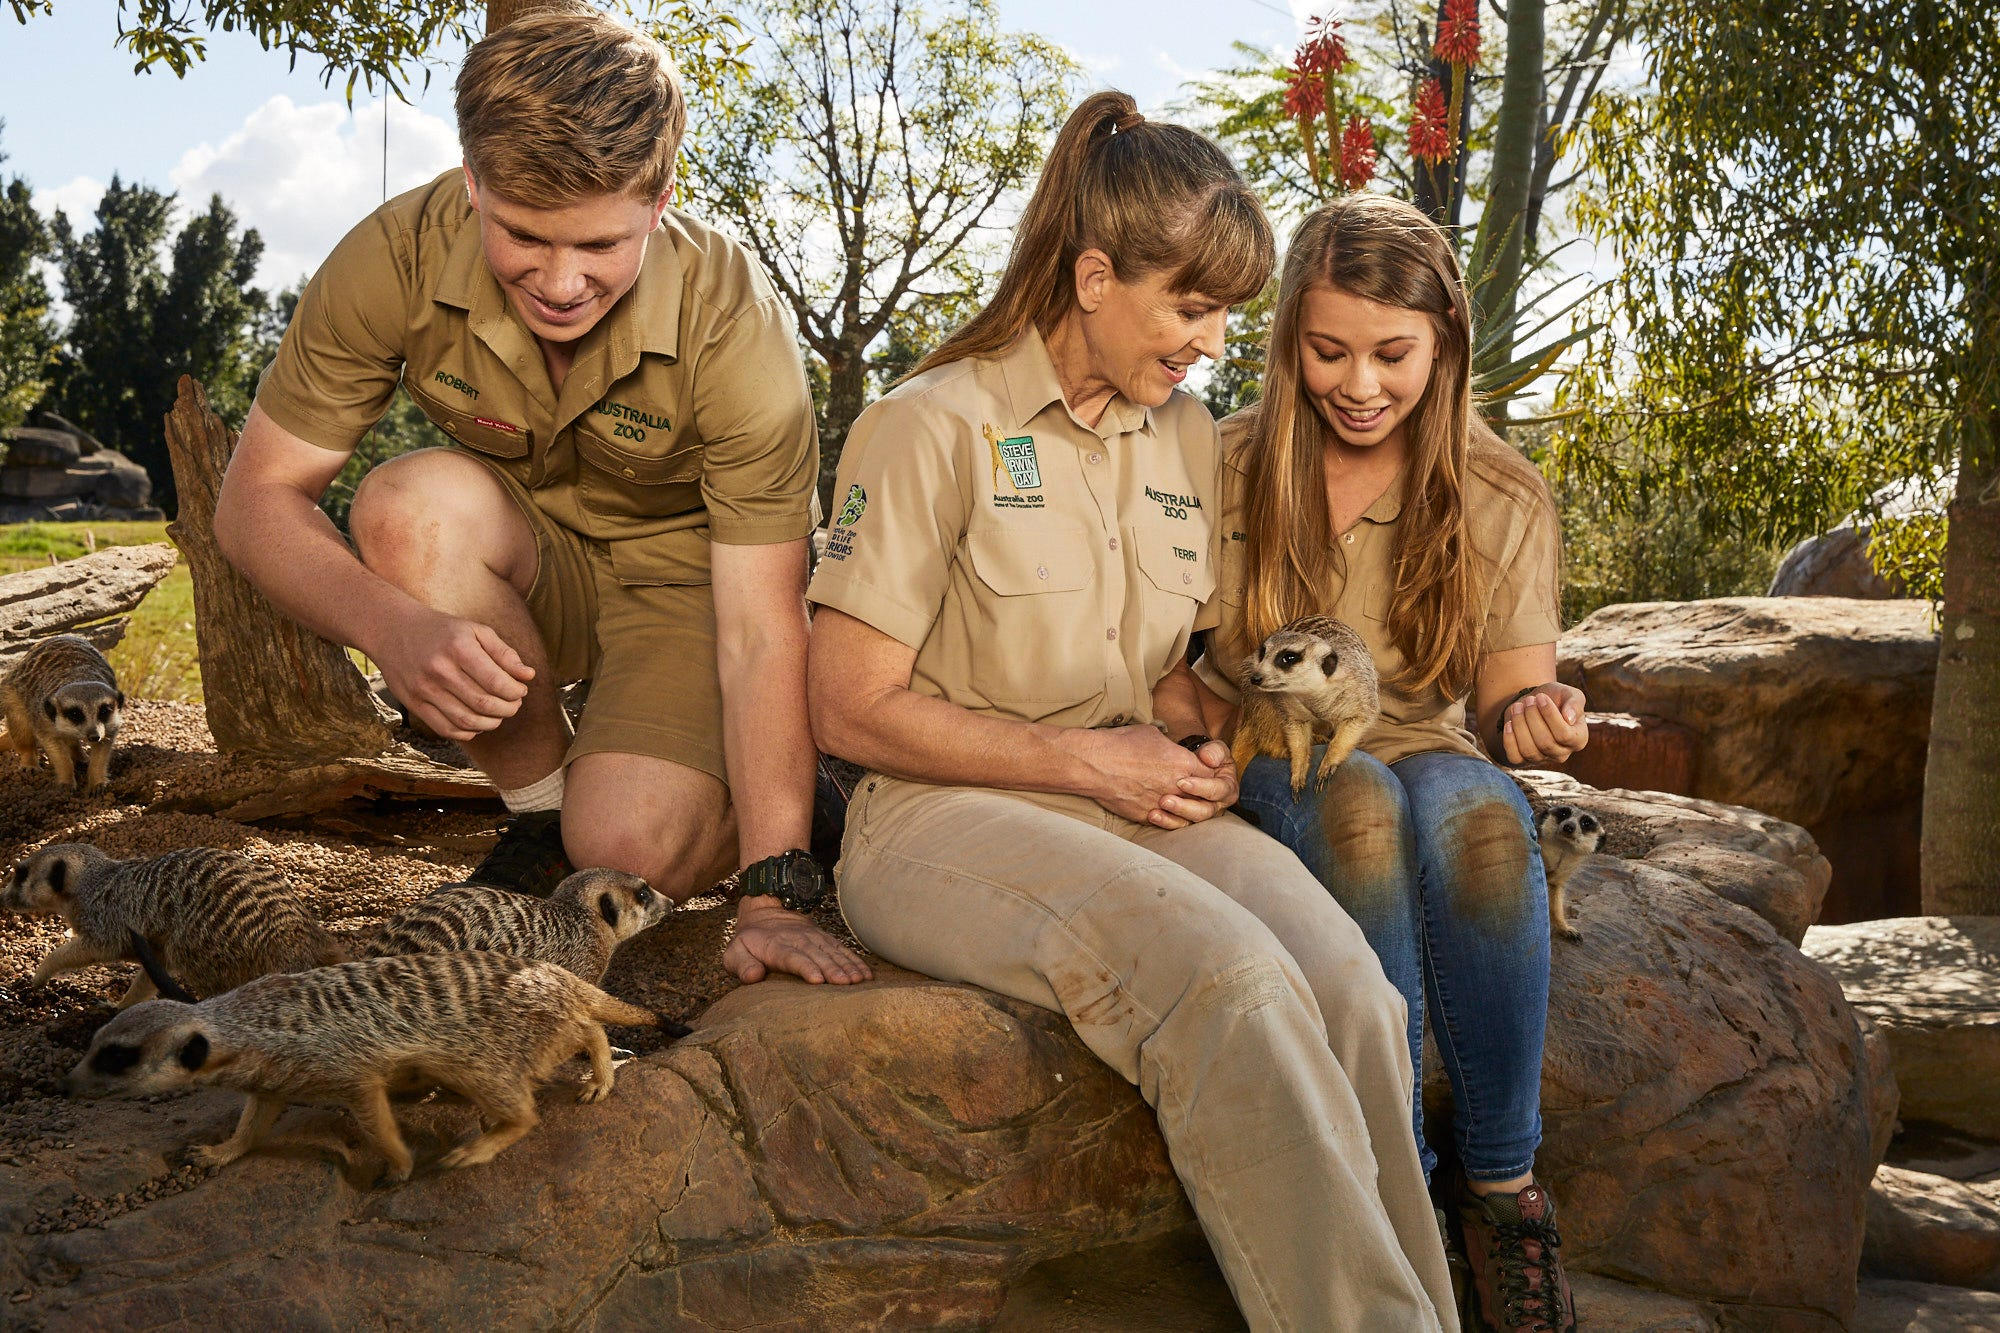 Love you beyond description : Bindi shares touching post for Steve Irwin s birthday